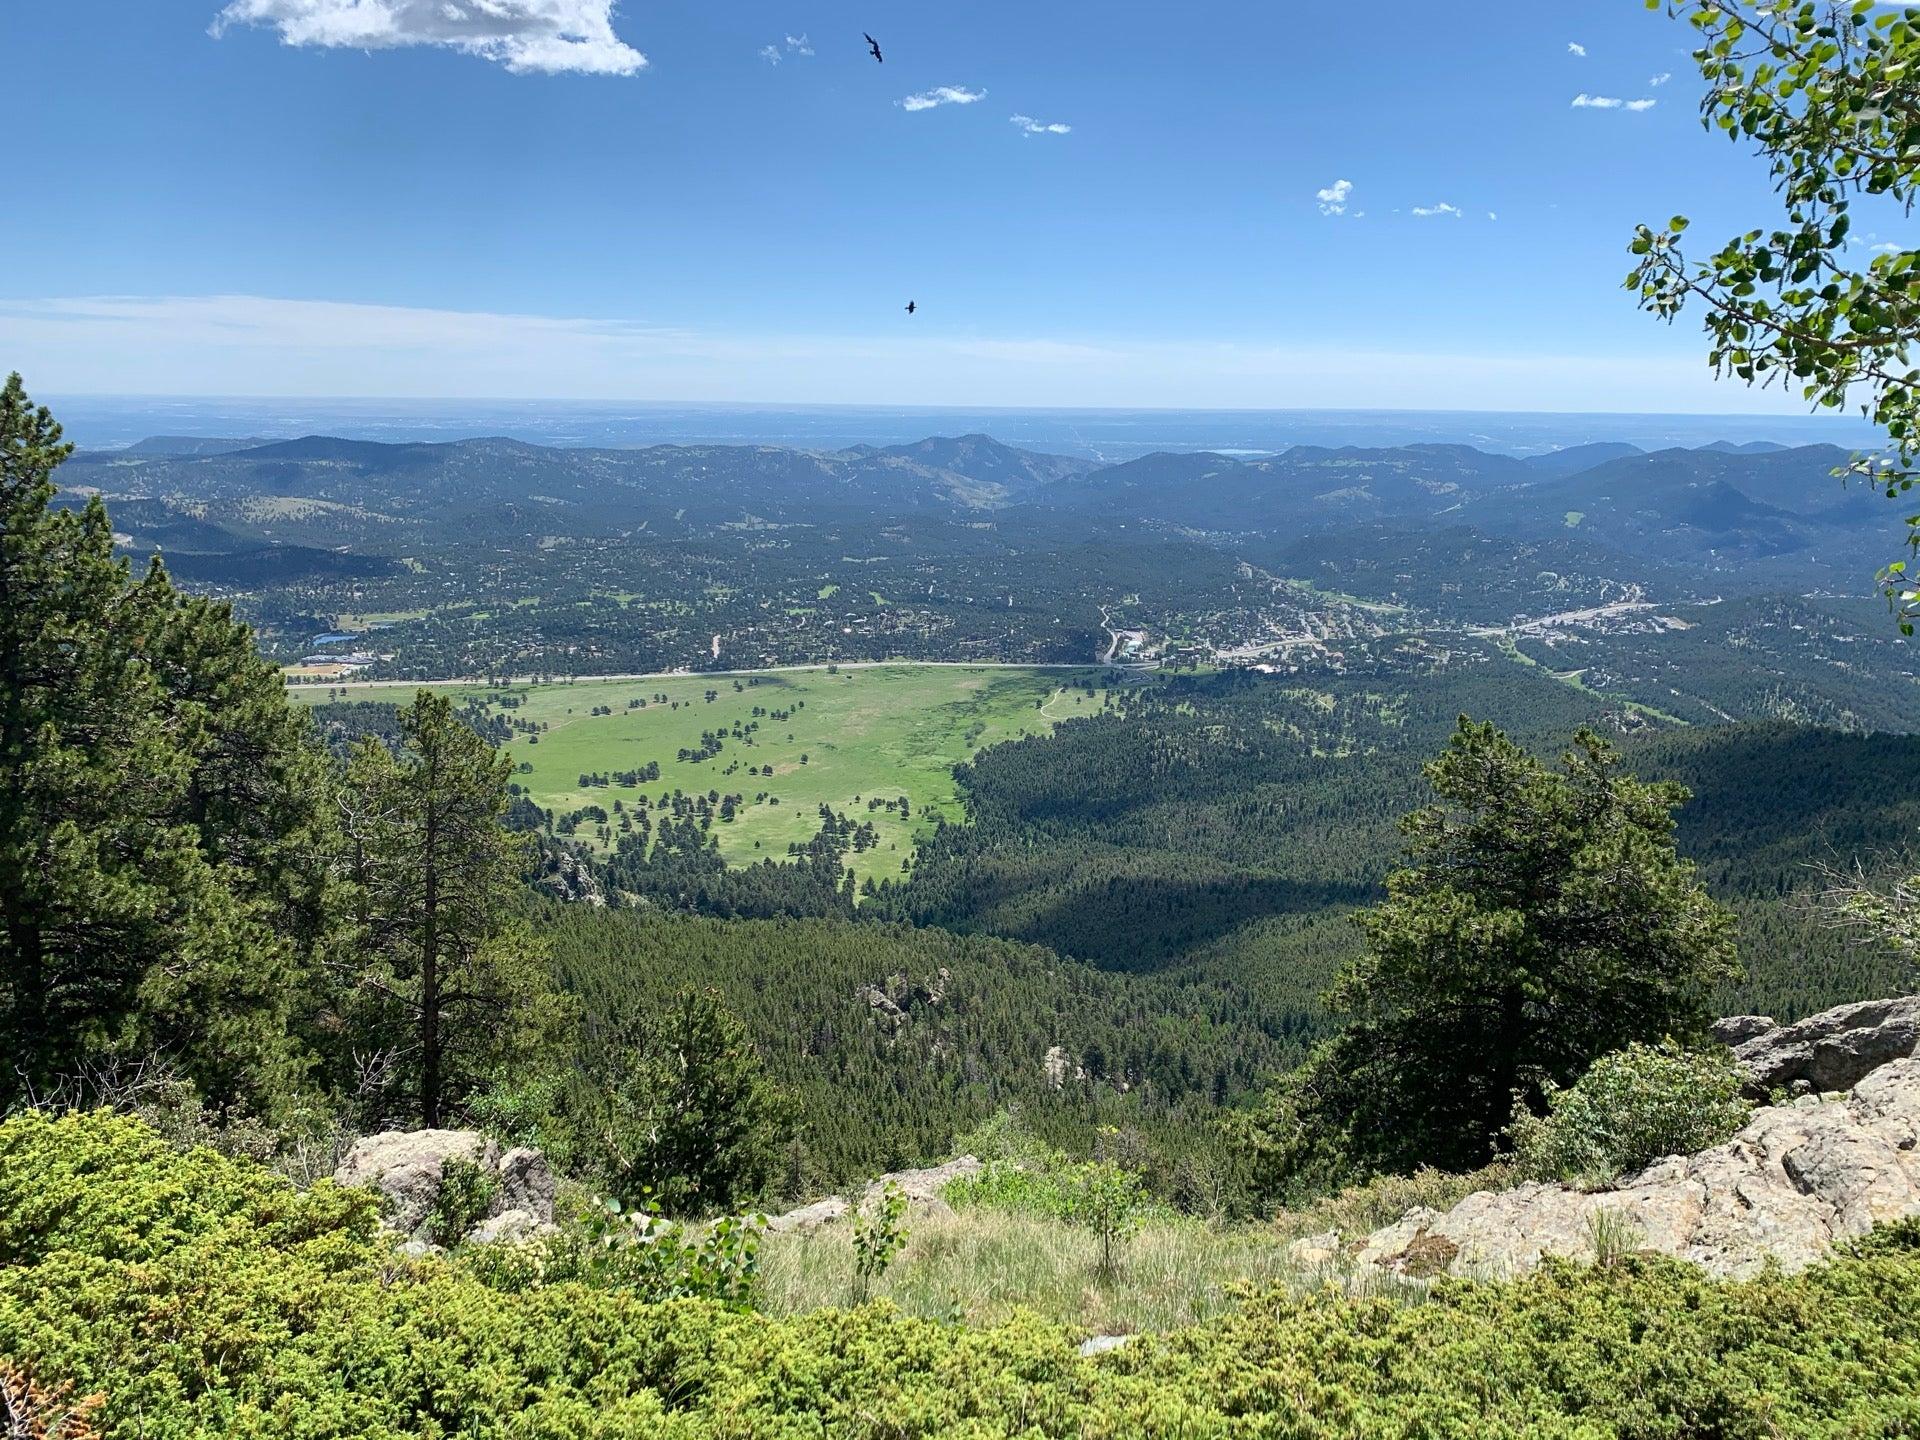 Checked in at Bergen Peak Trail